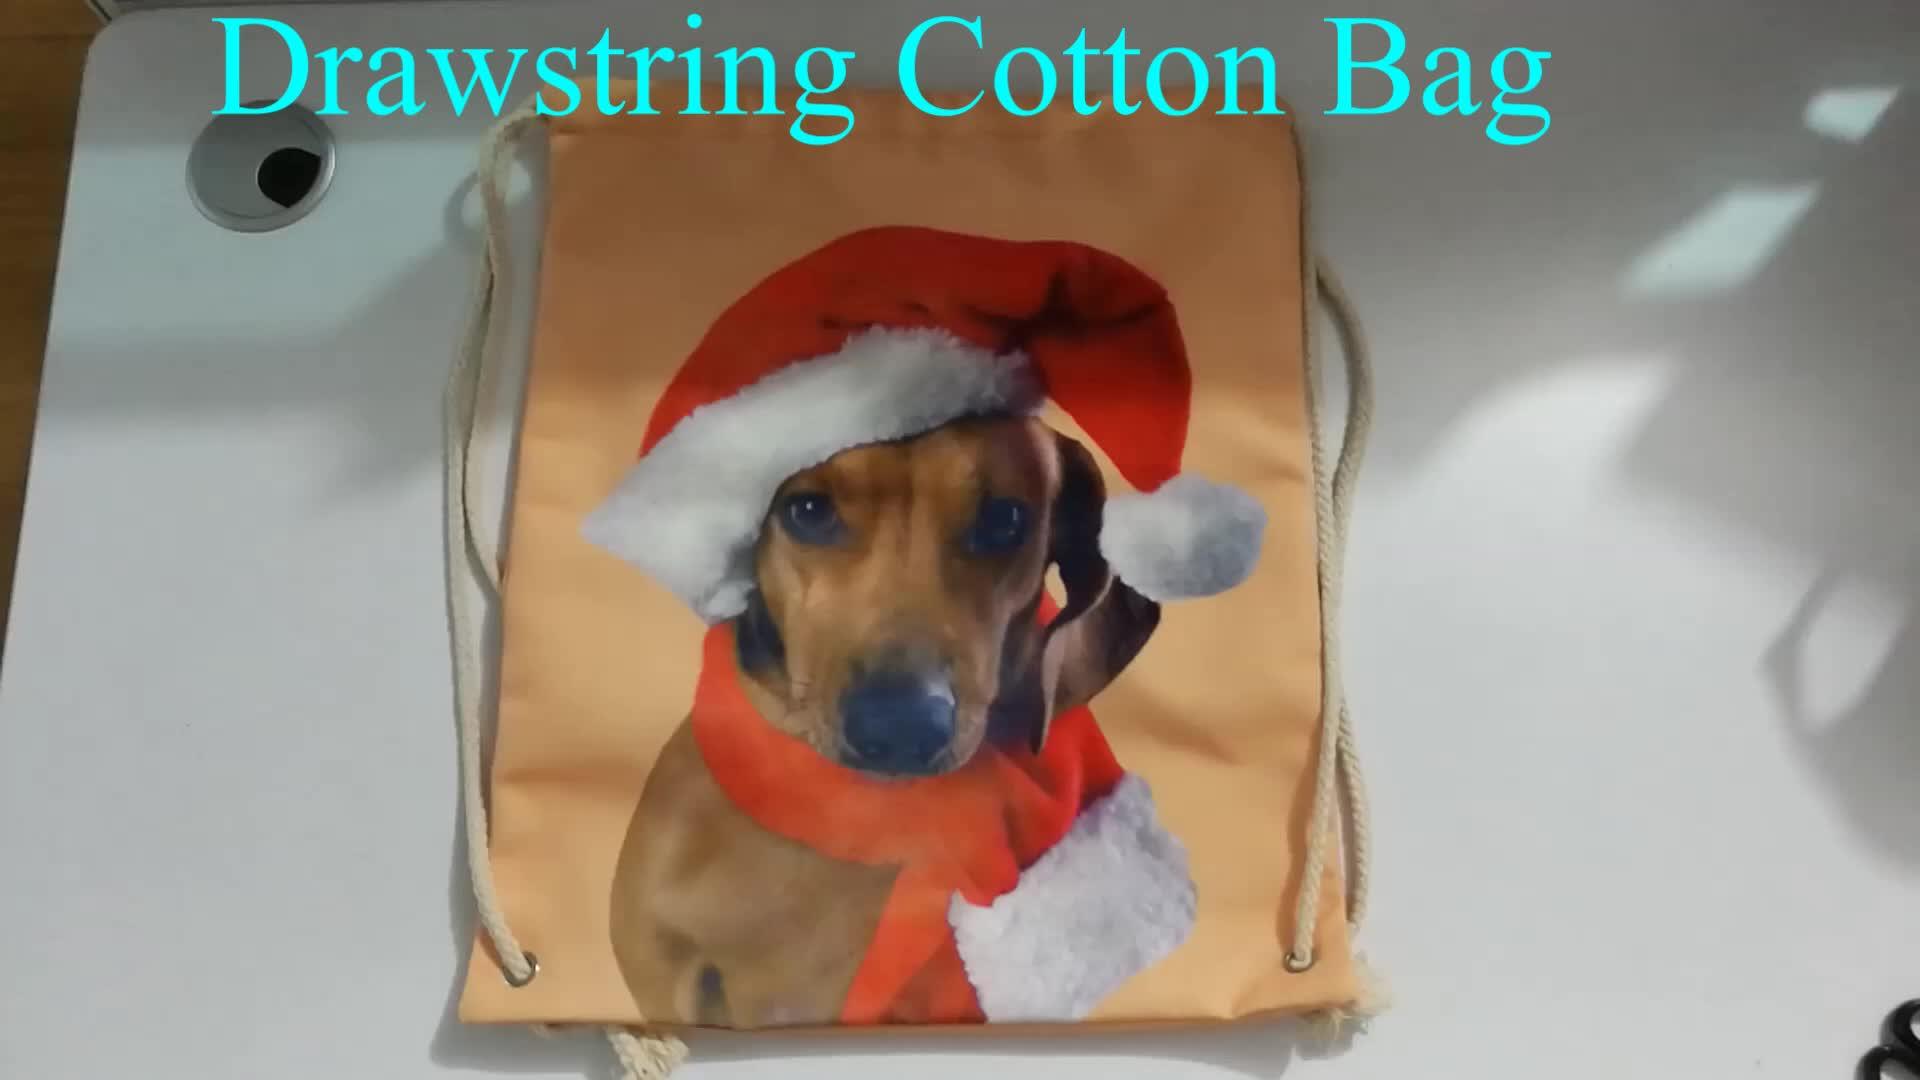 2020 Hot sale promotion gift 100% cotton drawstring bag